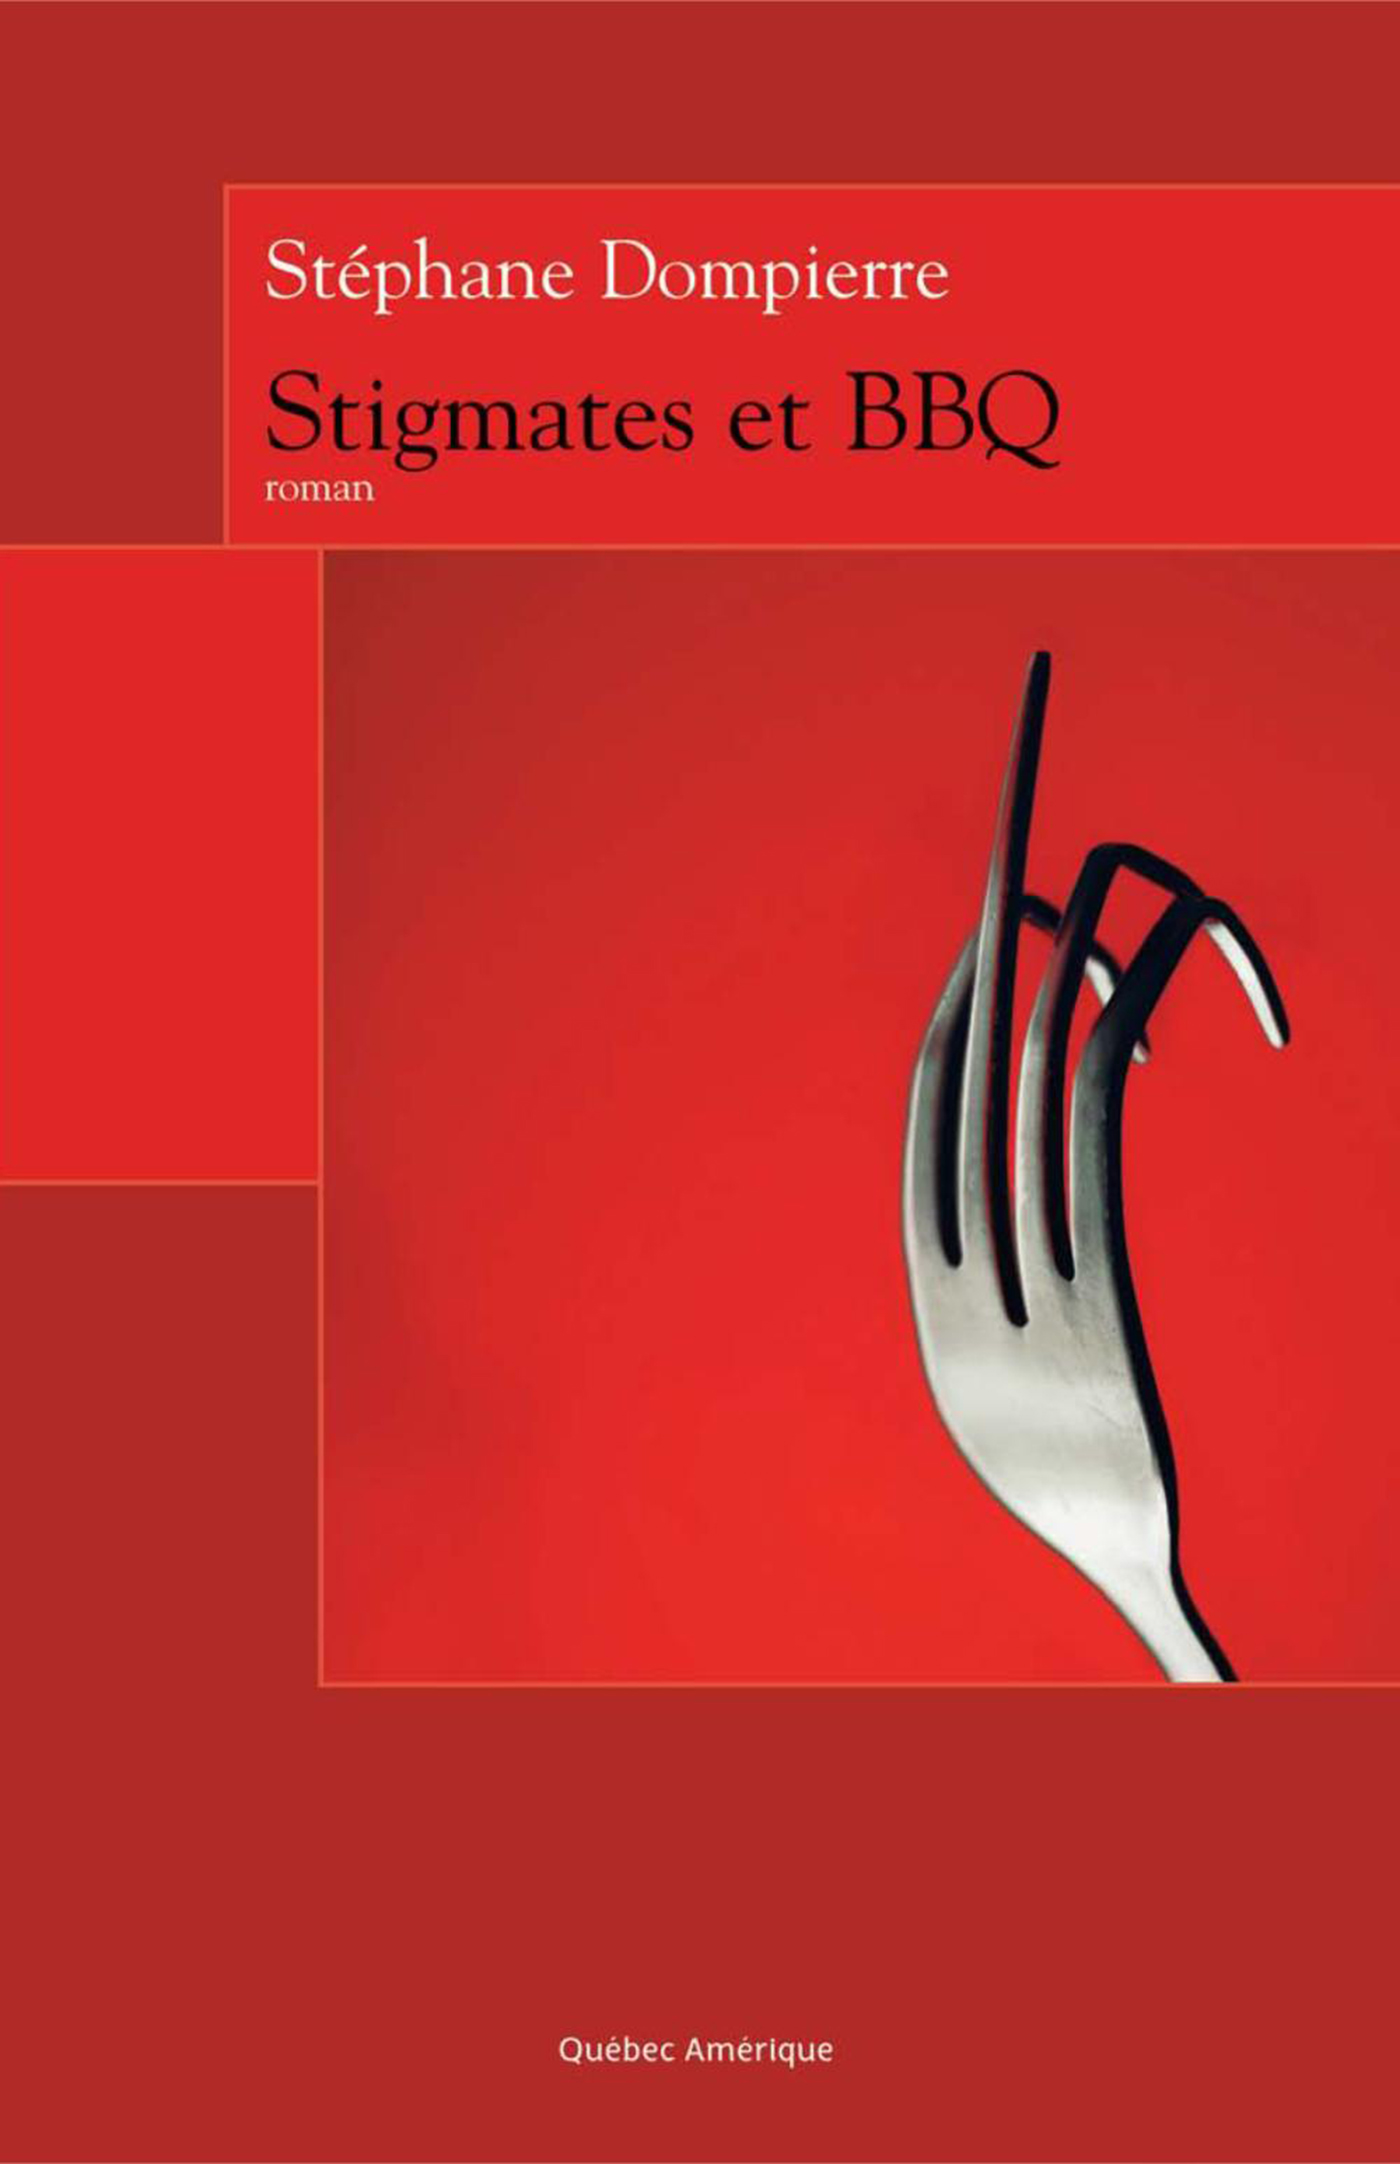 Stigmates et BBQ